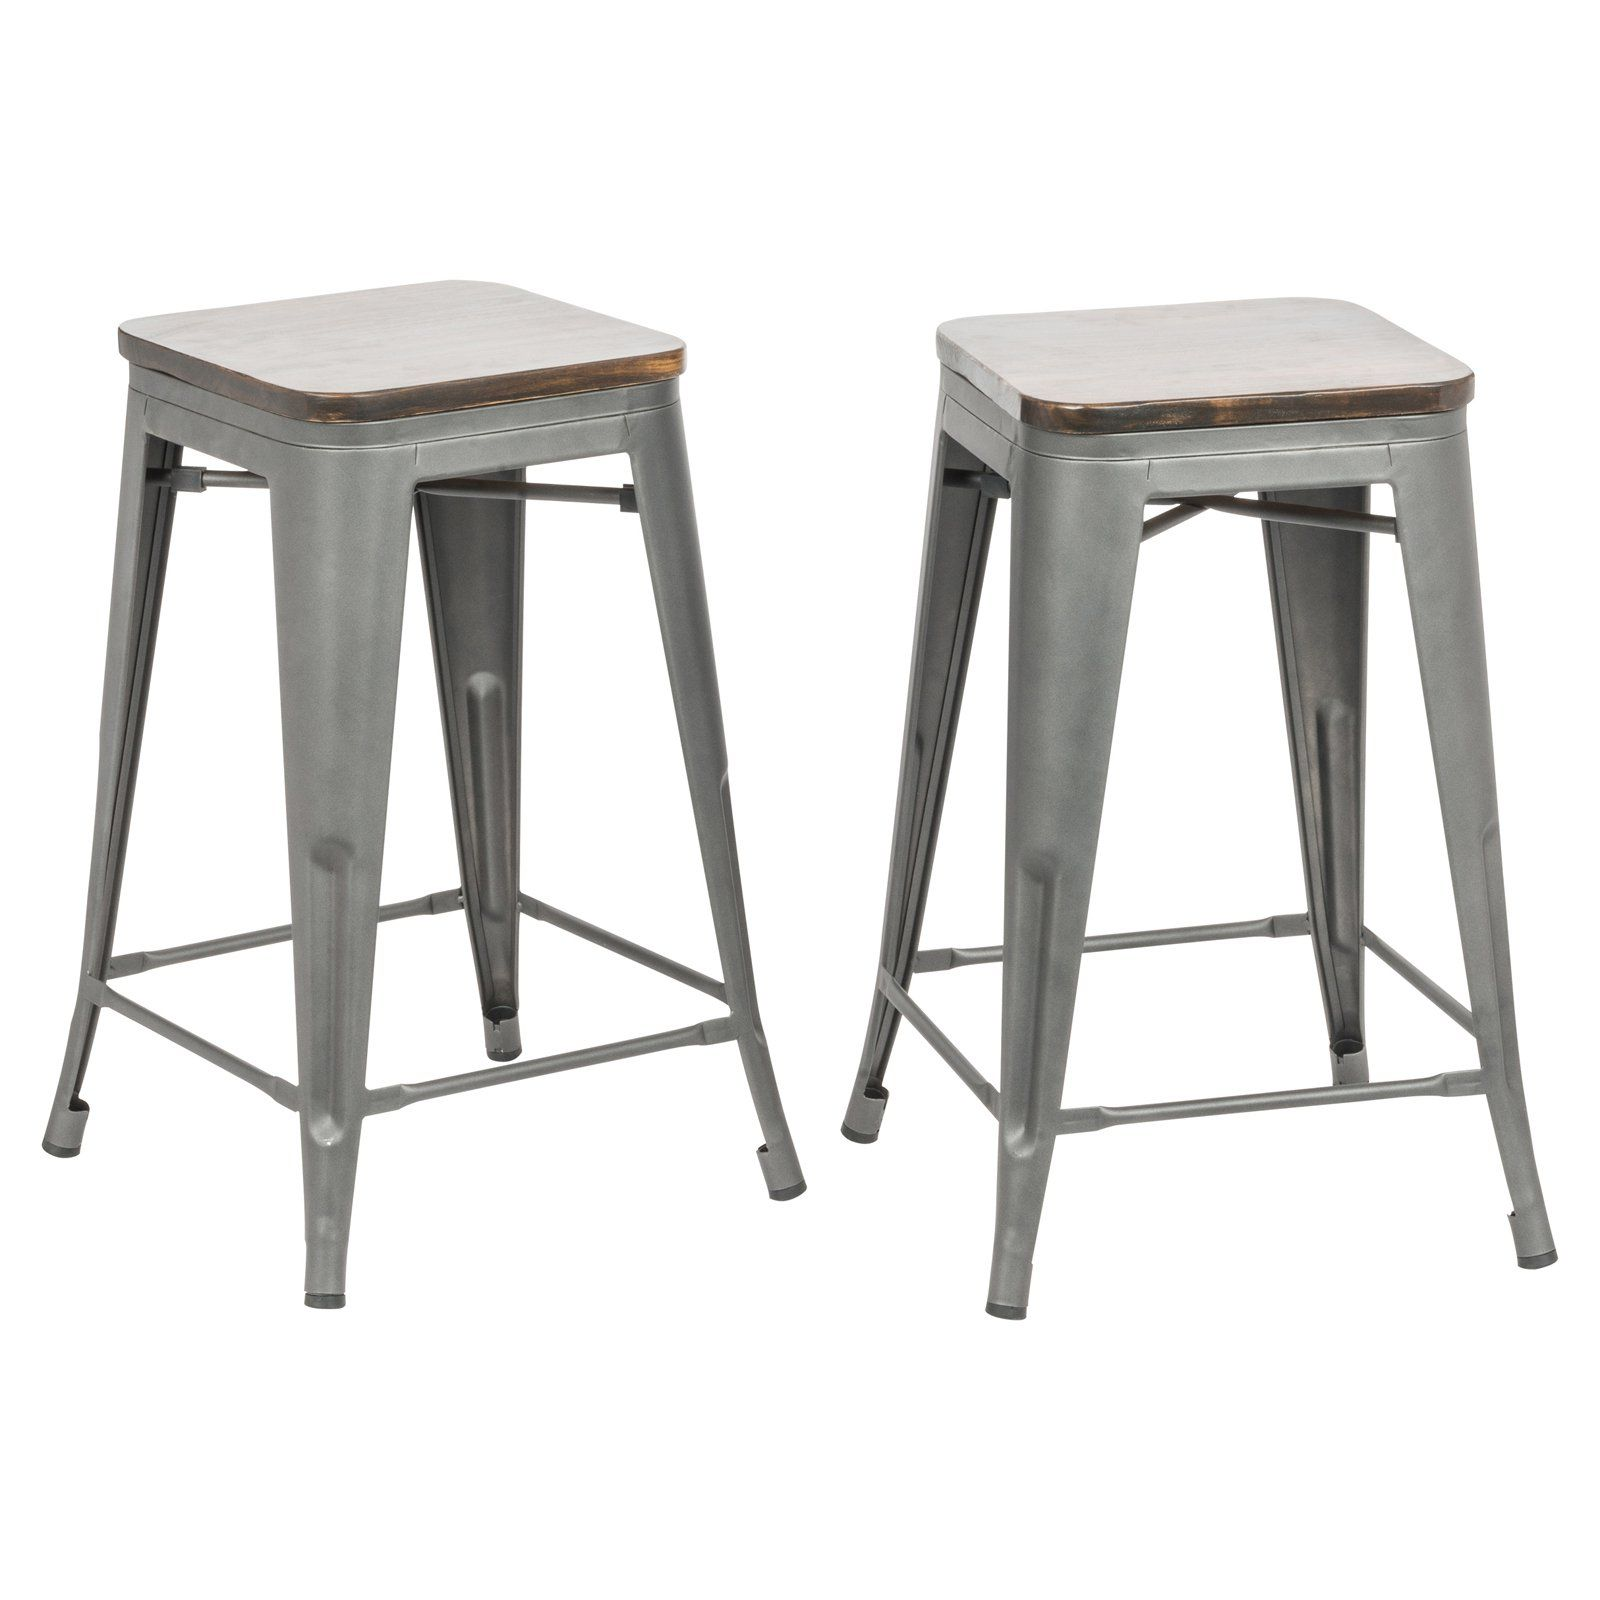 Carolina Chair Table Co Truett 24 In Square Backless Counter